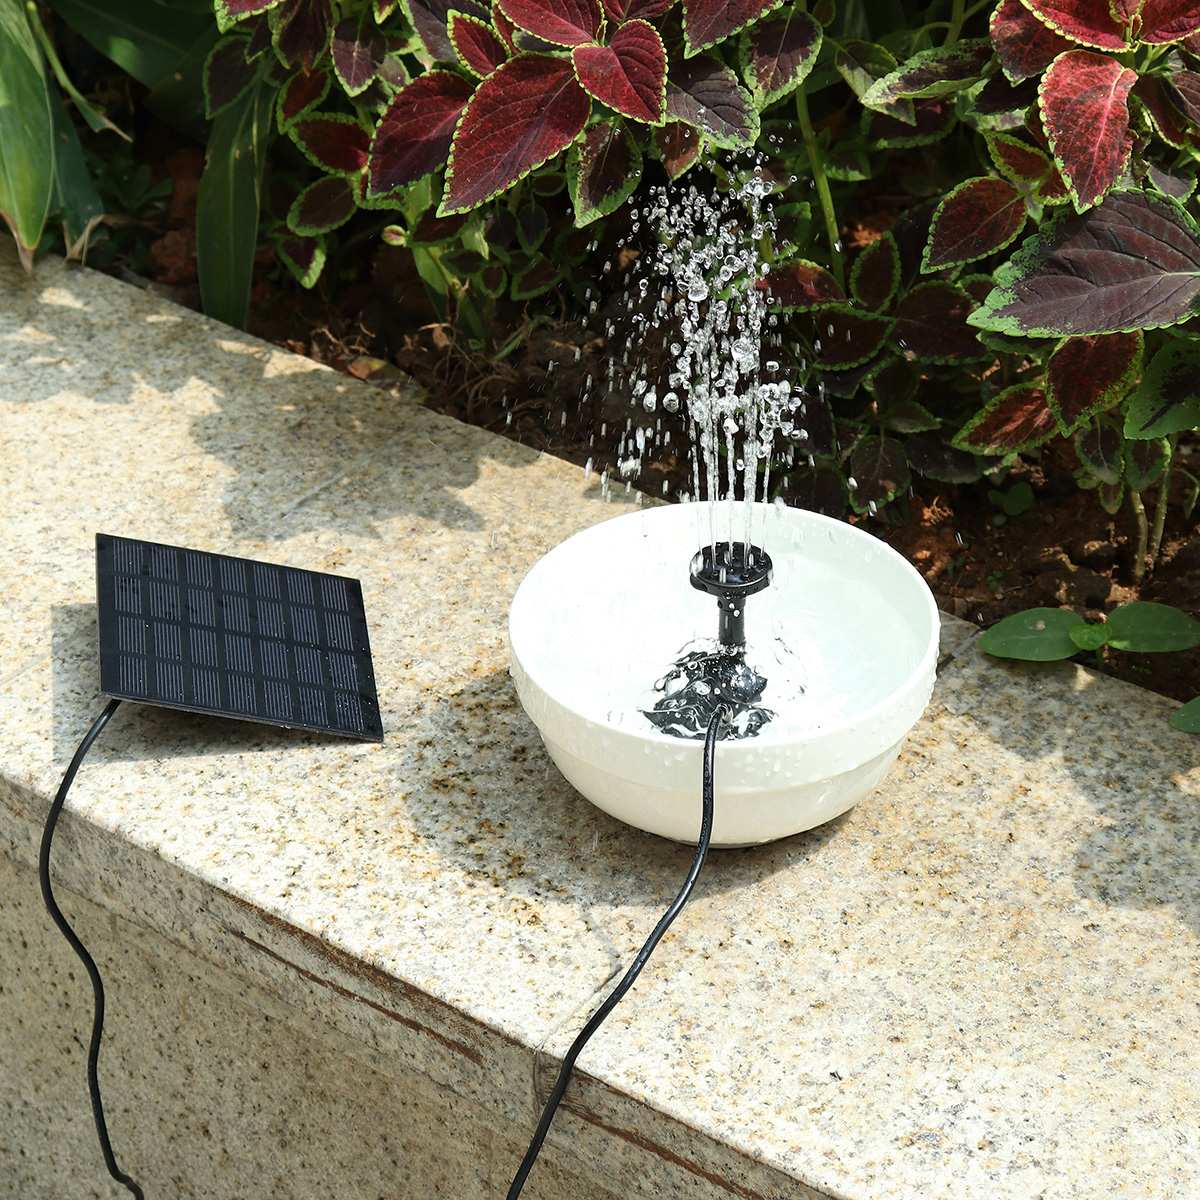 Solar Fountain Water Pump for Bird Bath Solar Panel Kit Fountain for Small Pond Garden Solar Pumping Eqiupment